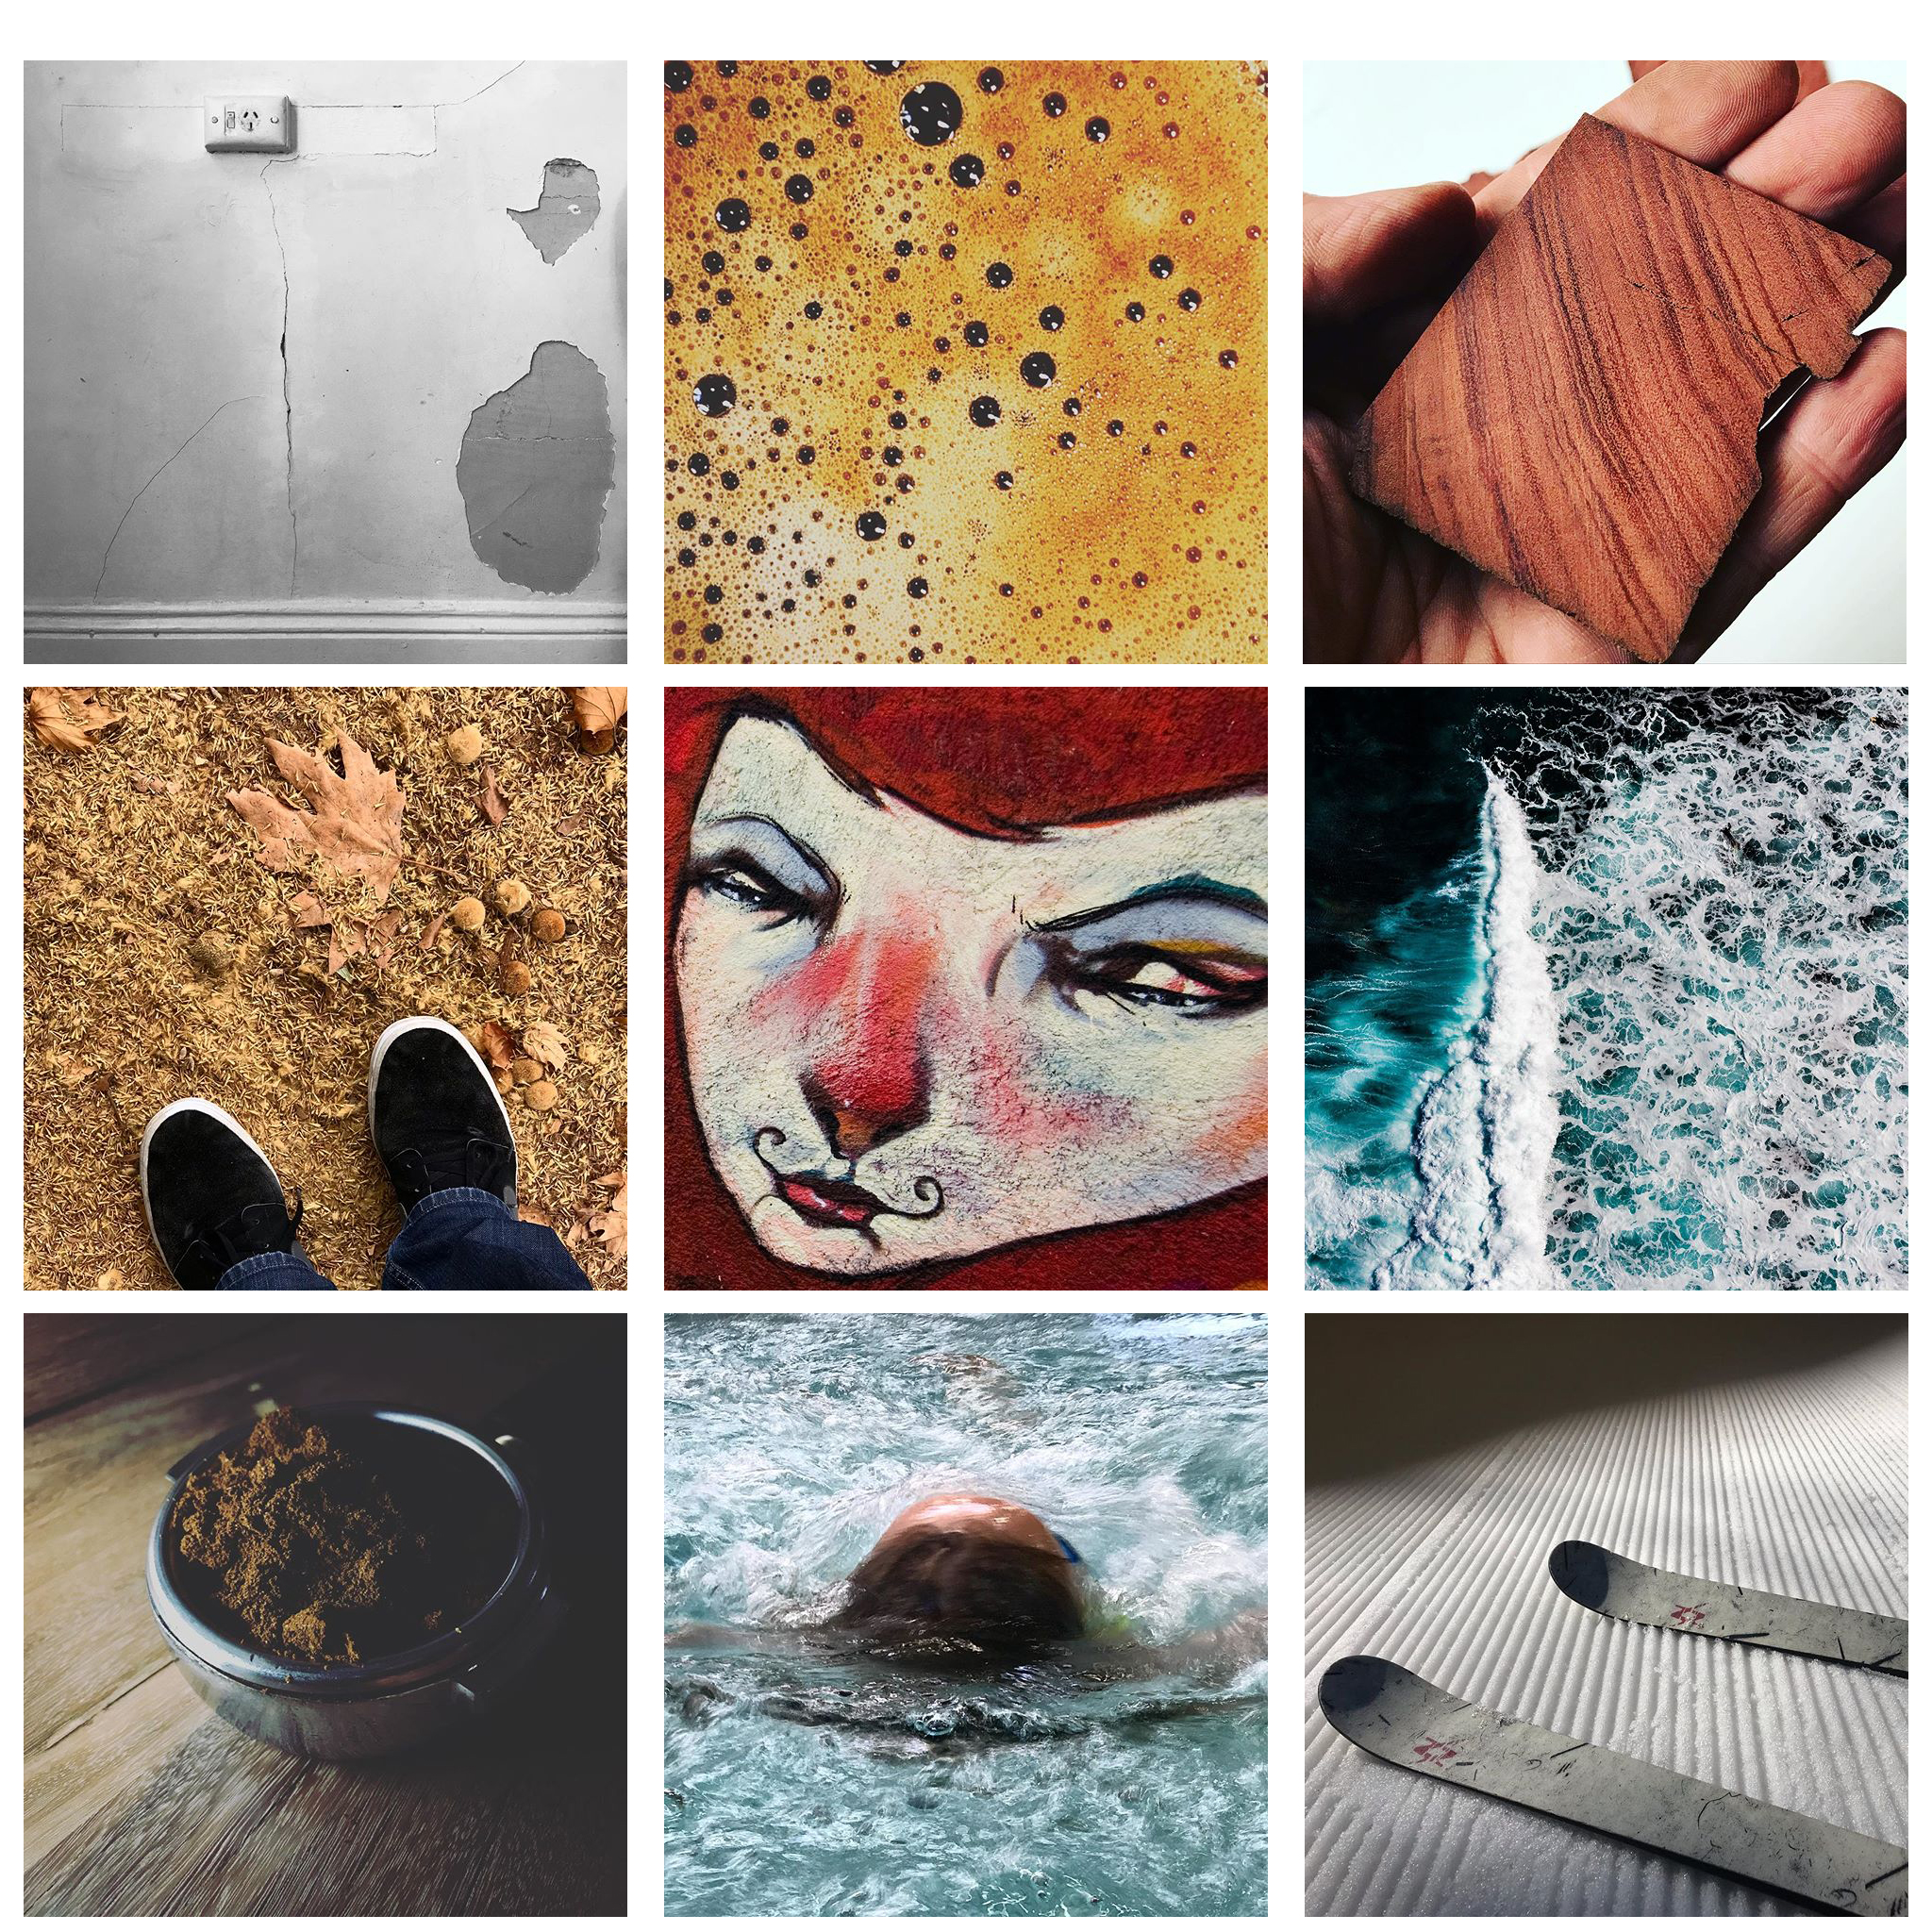 Desafio Fotográfico Semanal - Textura